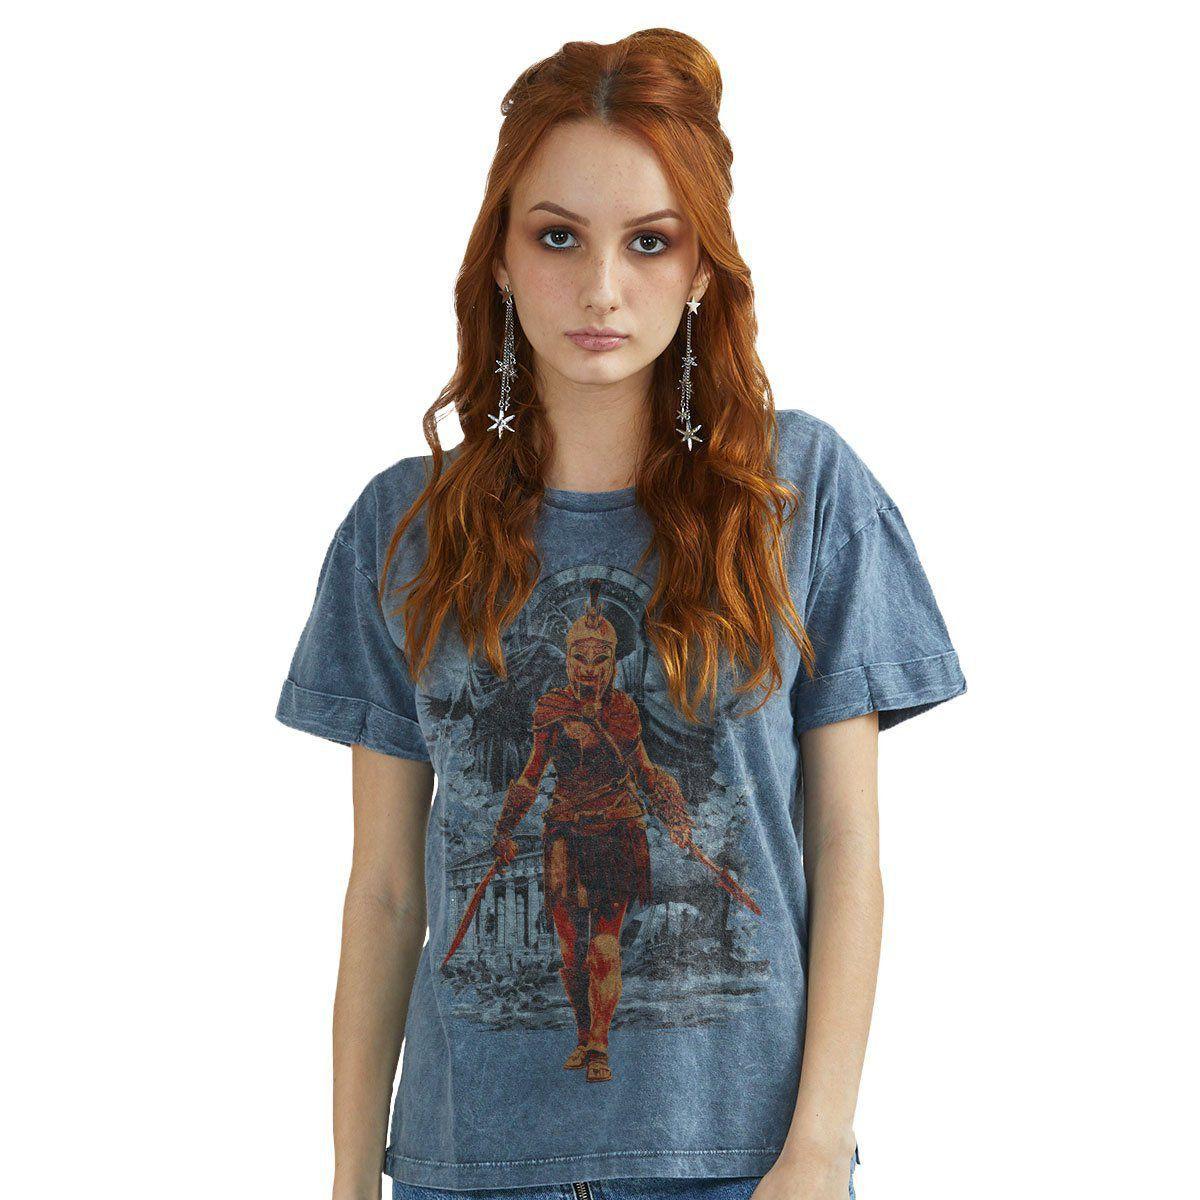 Camiseta Feminina Marmorizada Assassin